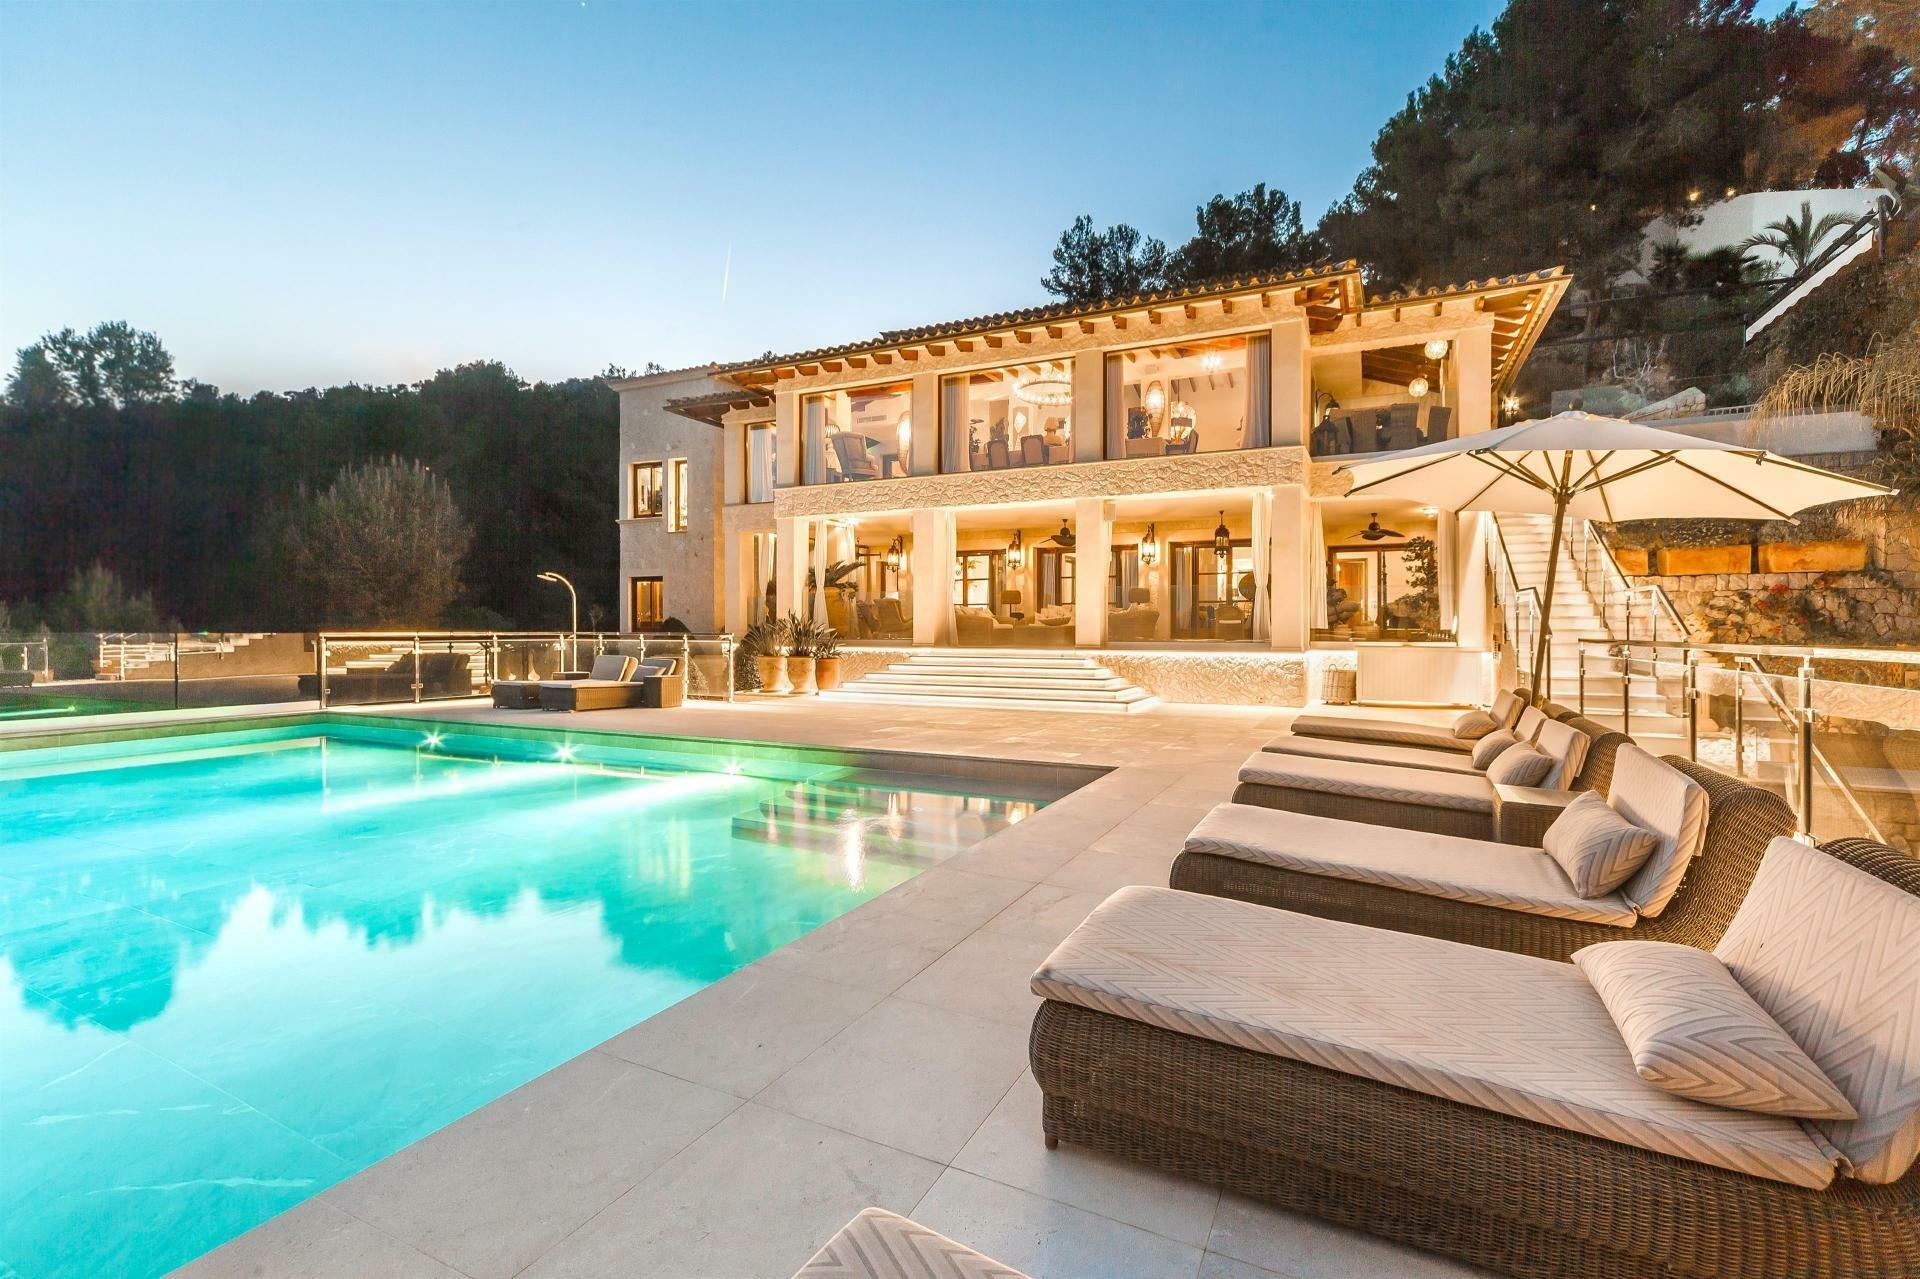 Villa in Palma, Balearic Islands, Spain 1 - 10848664